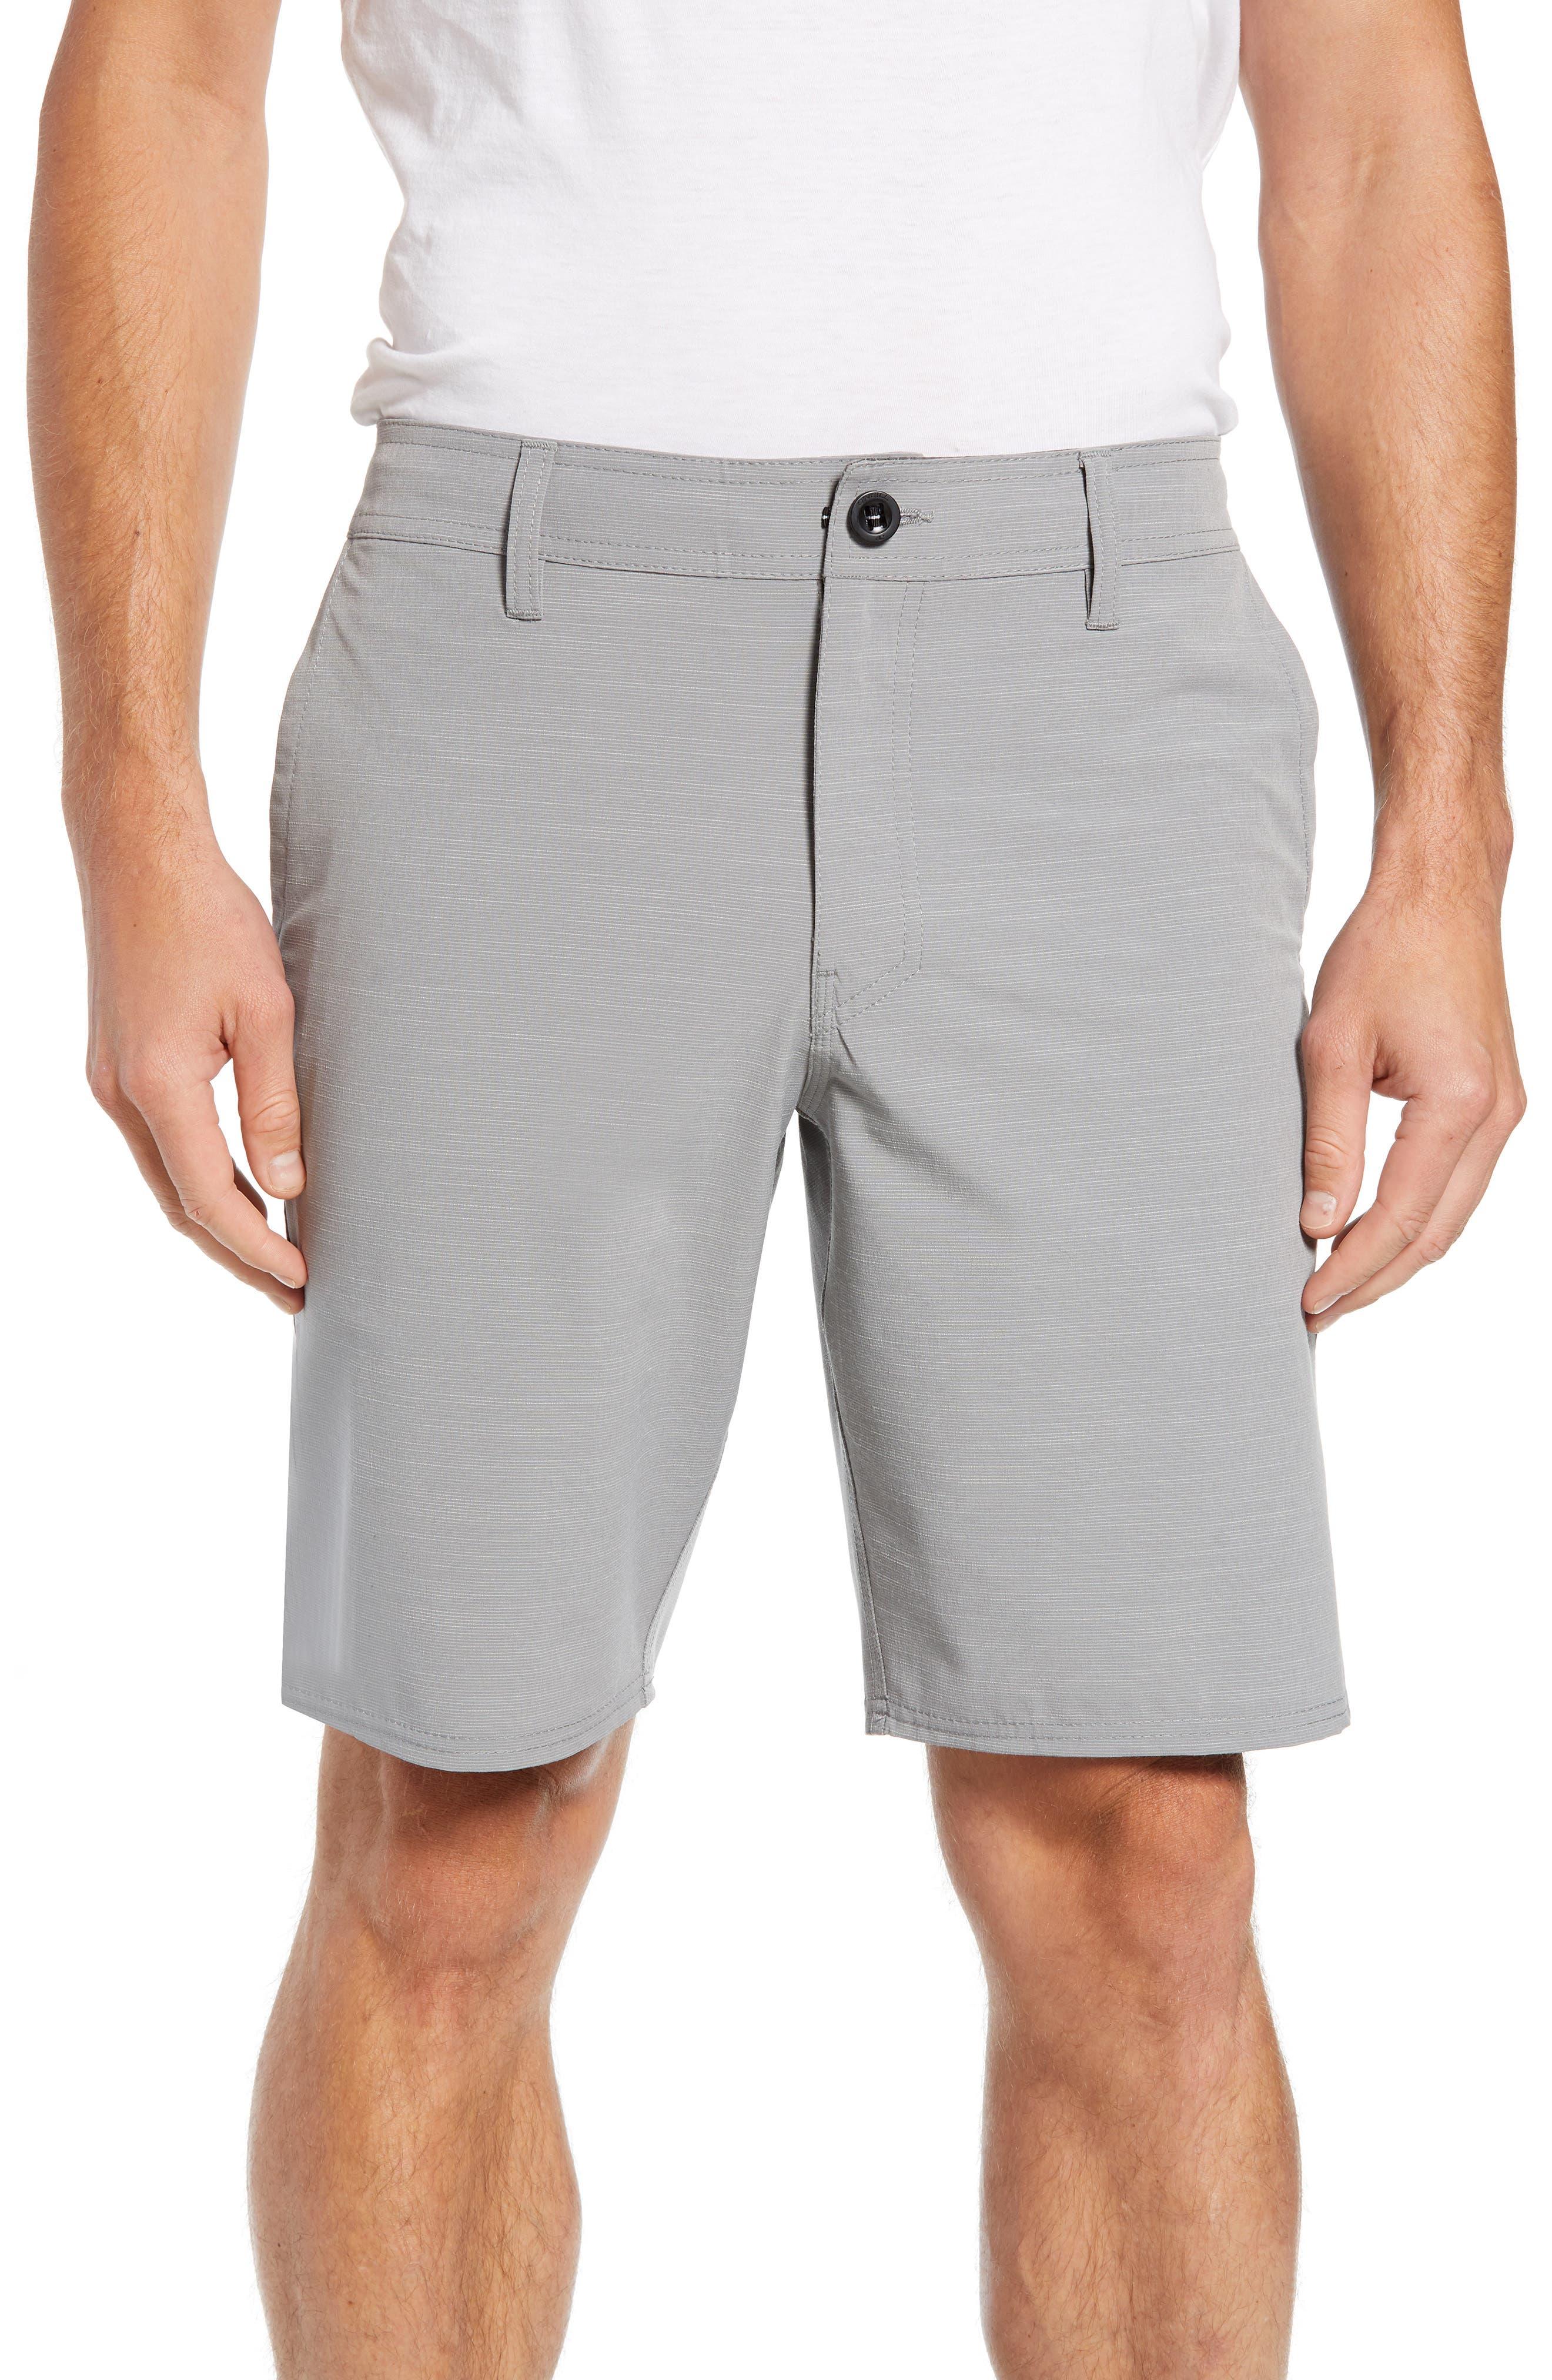 Locked Slub Hybrid Shorts,                         Main,                         color, 039